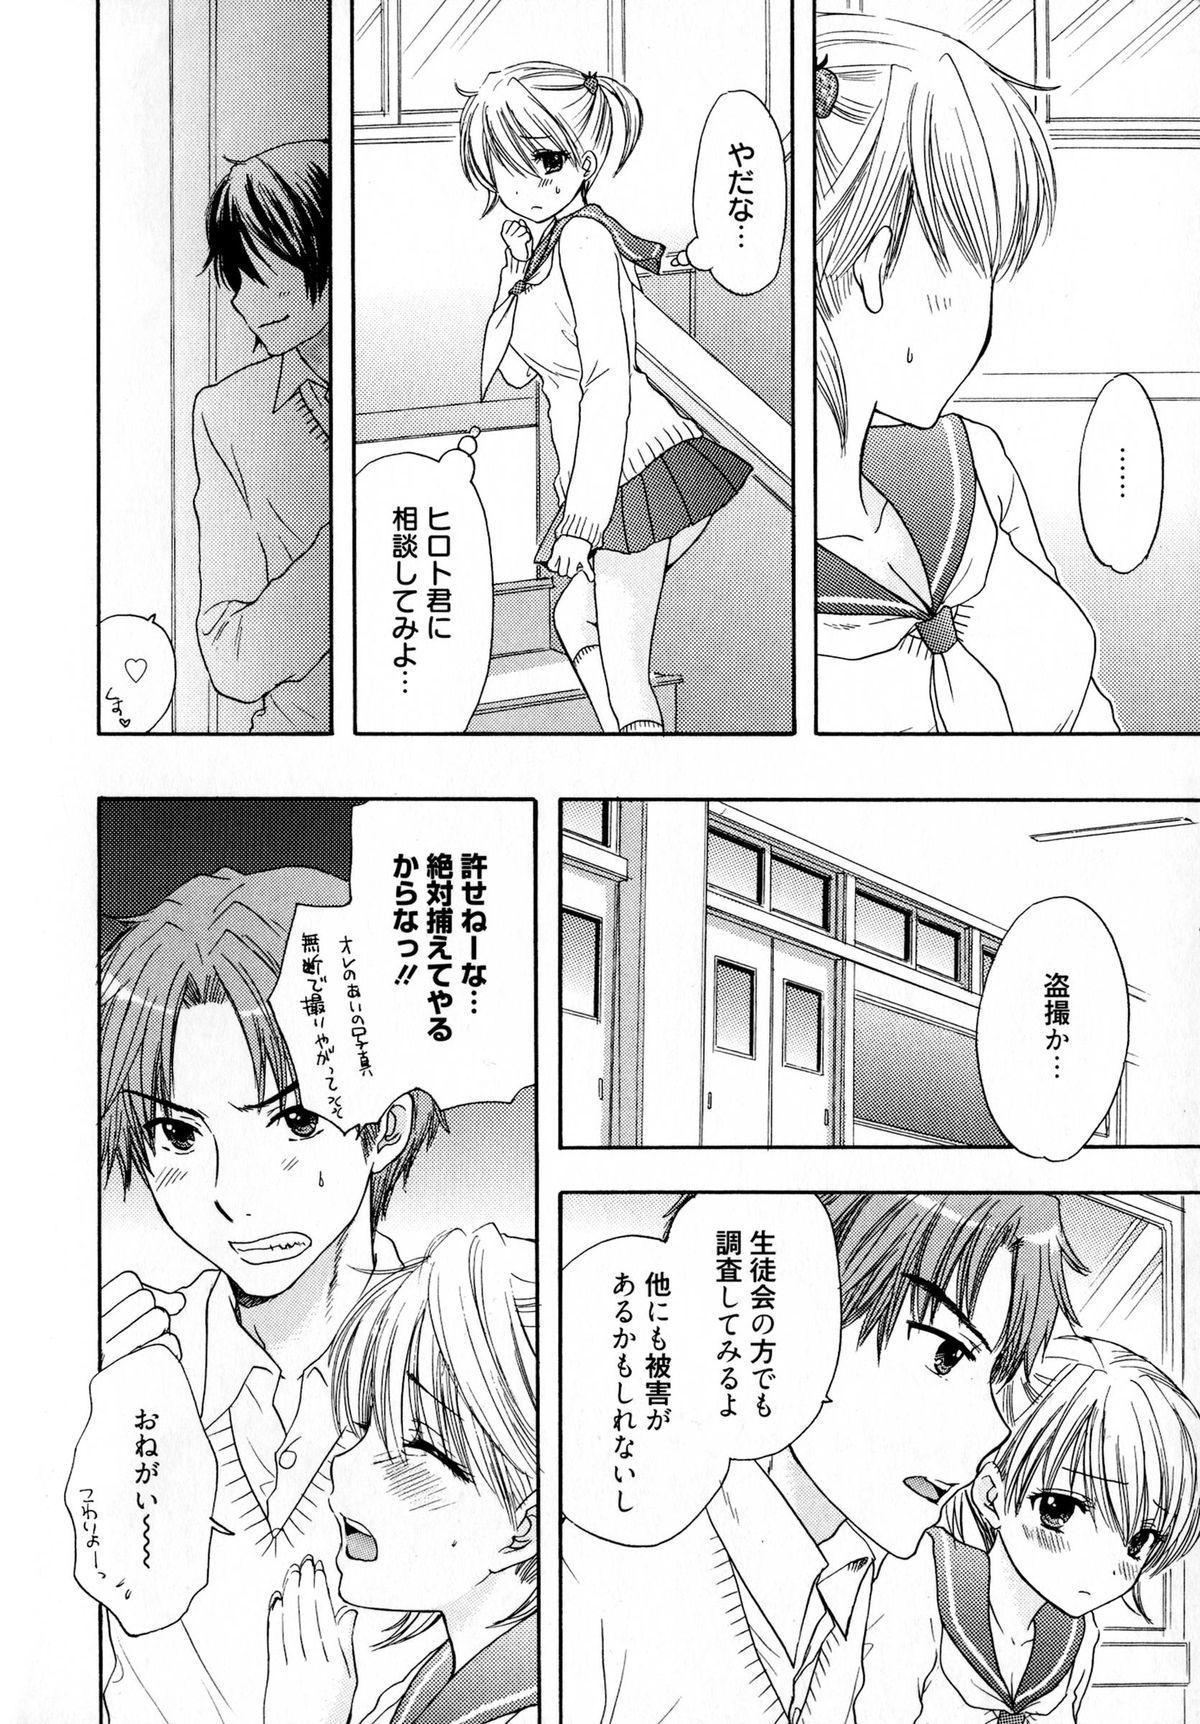 The Great Escape 4 Shokai Genteiban 185